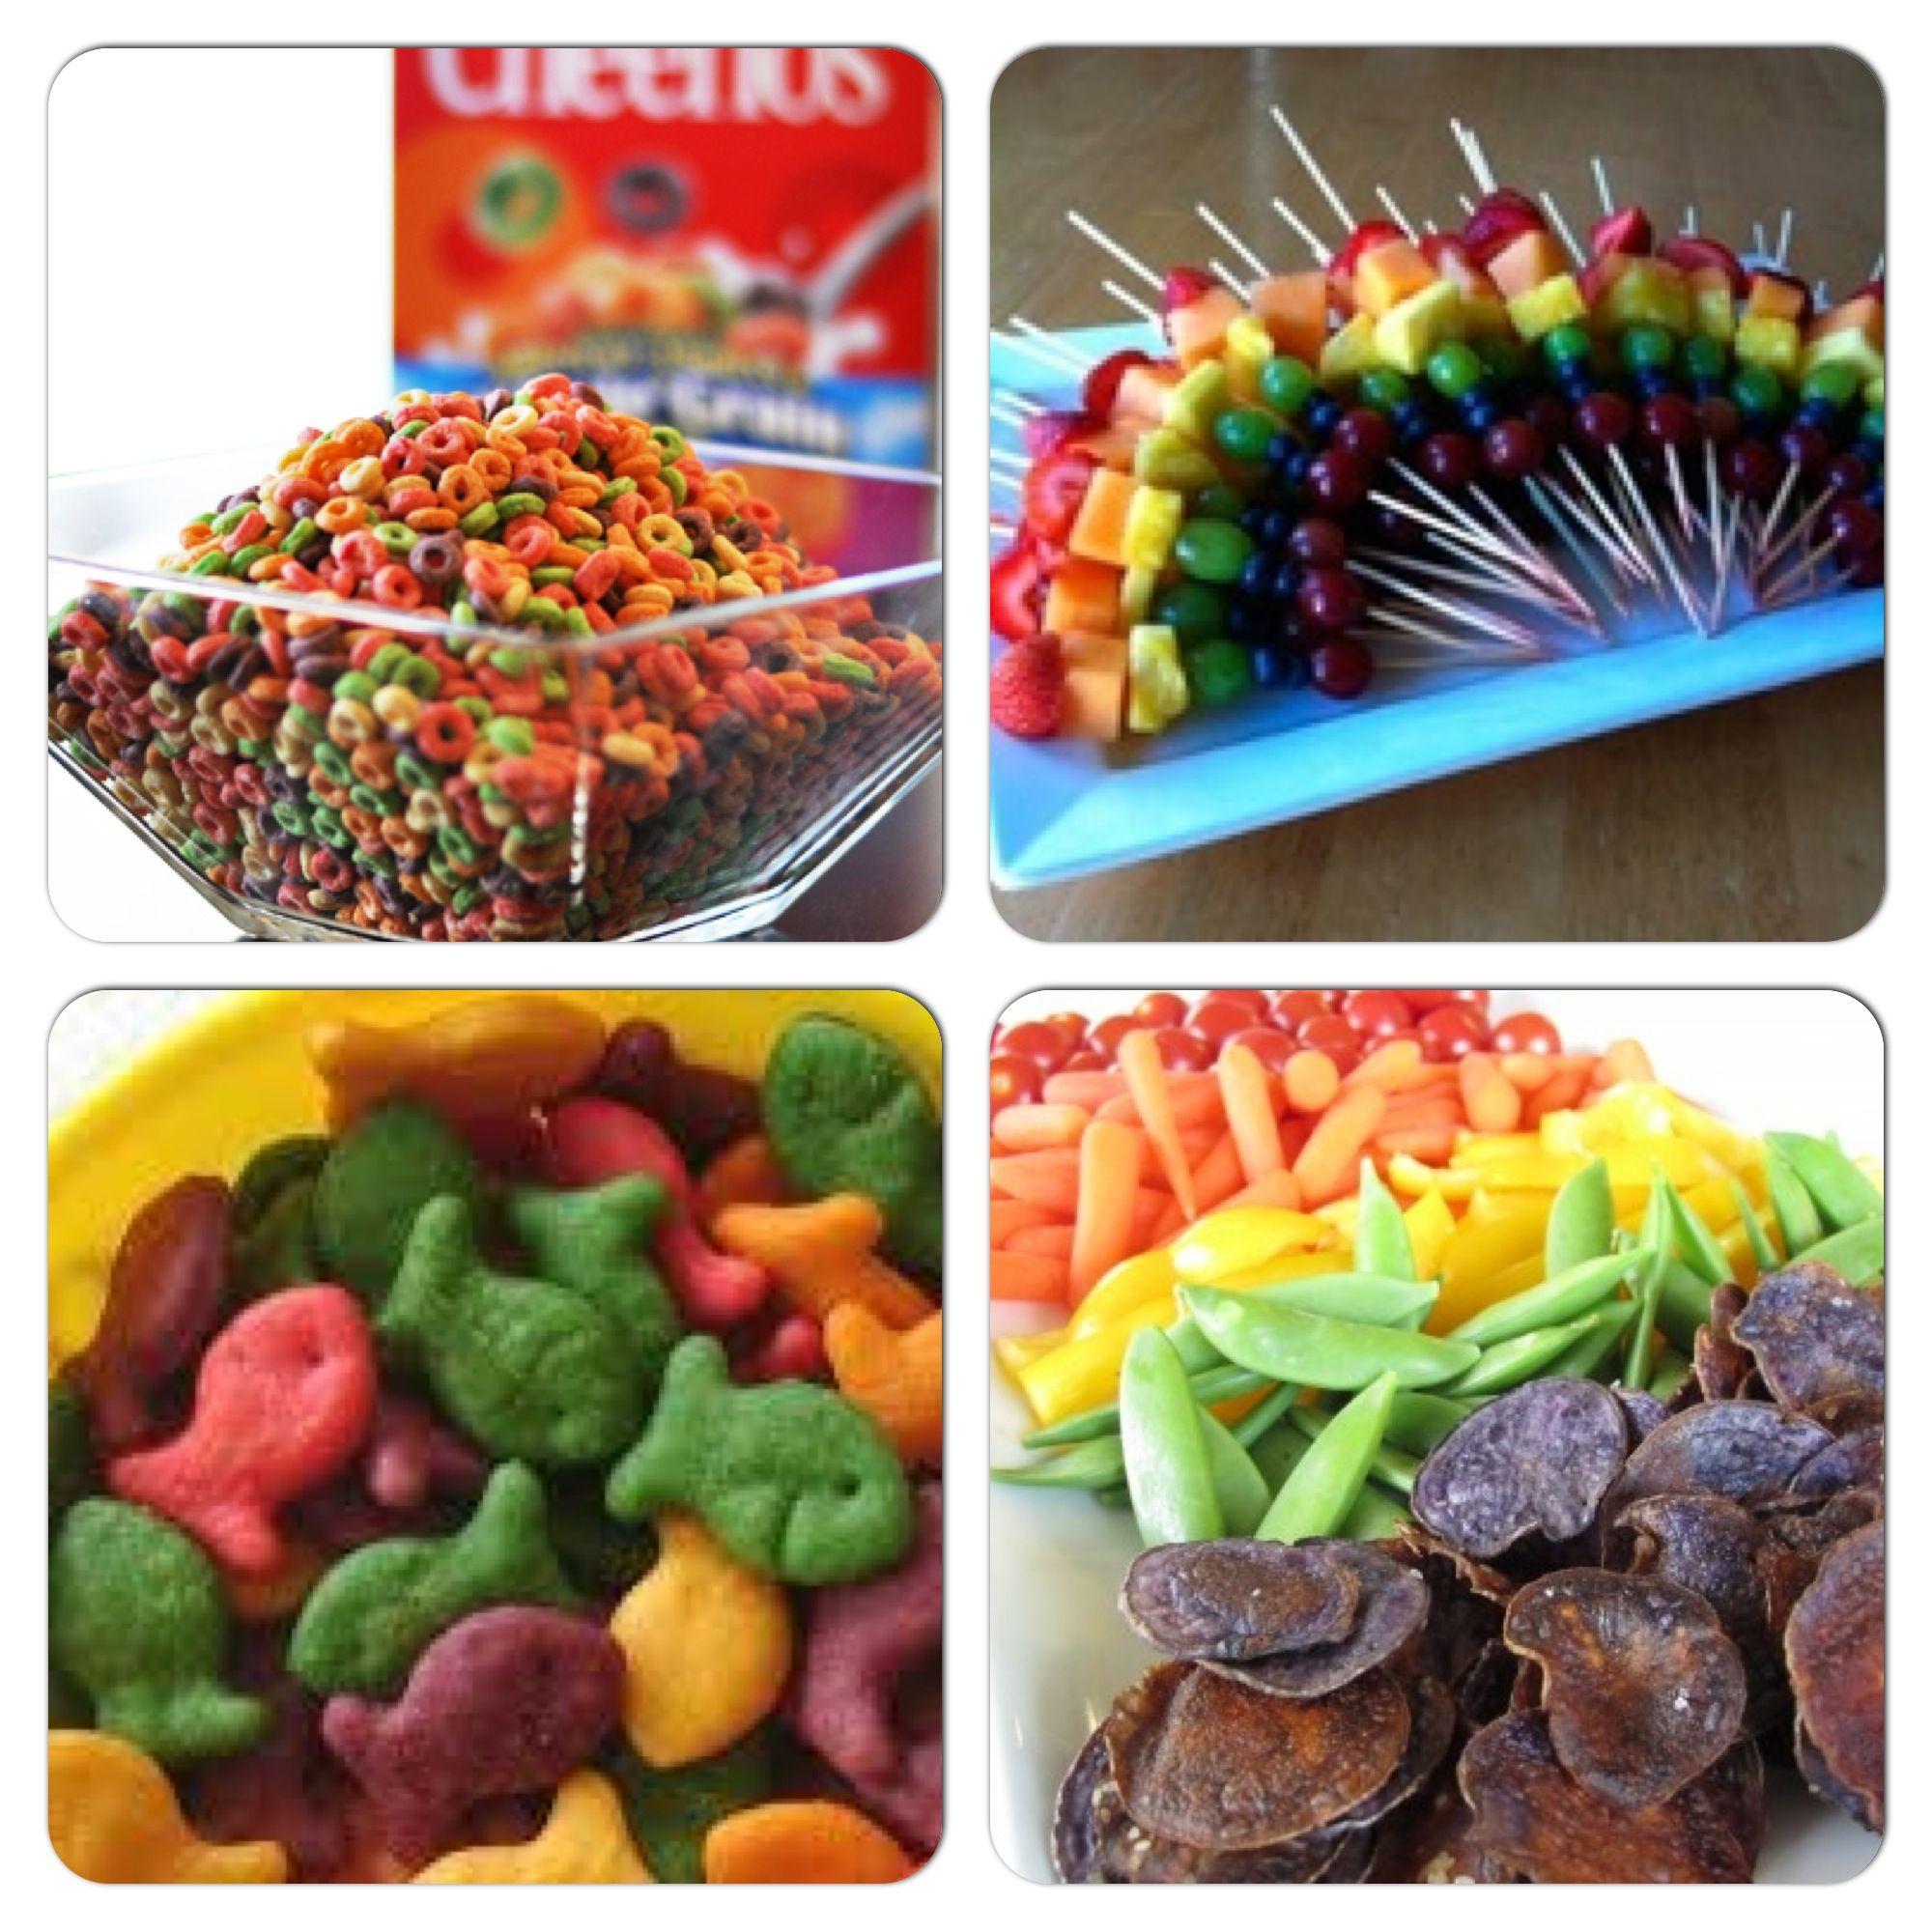 Rainbow Snacks For Sophia's 1st Birthday